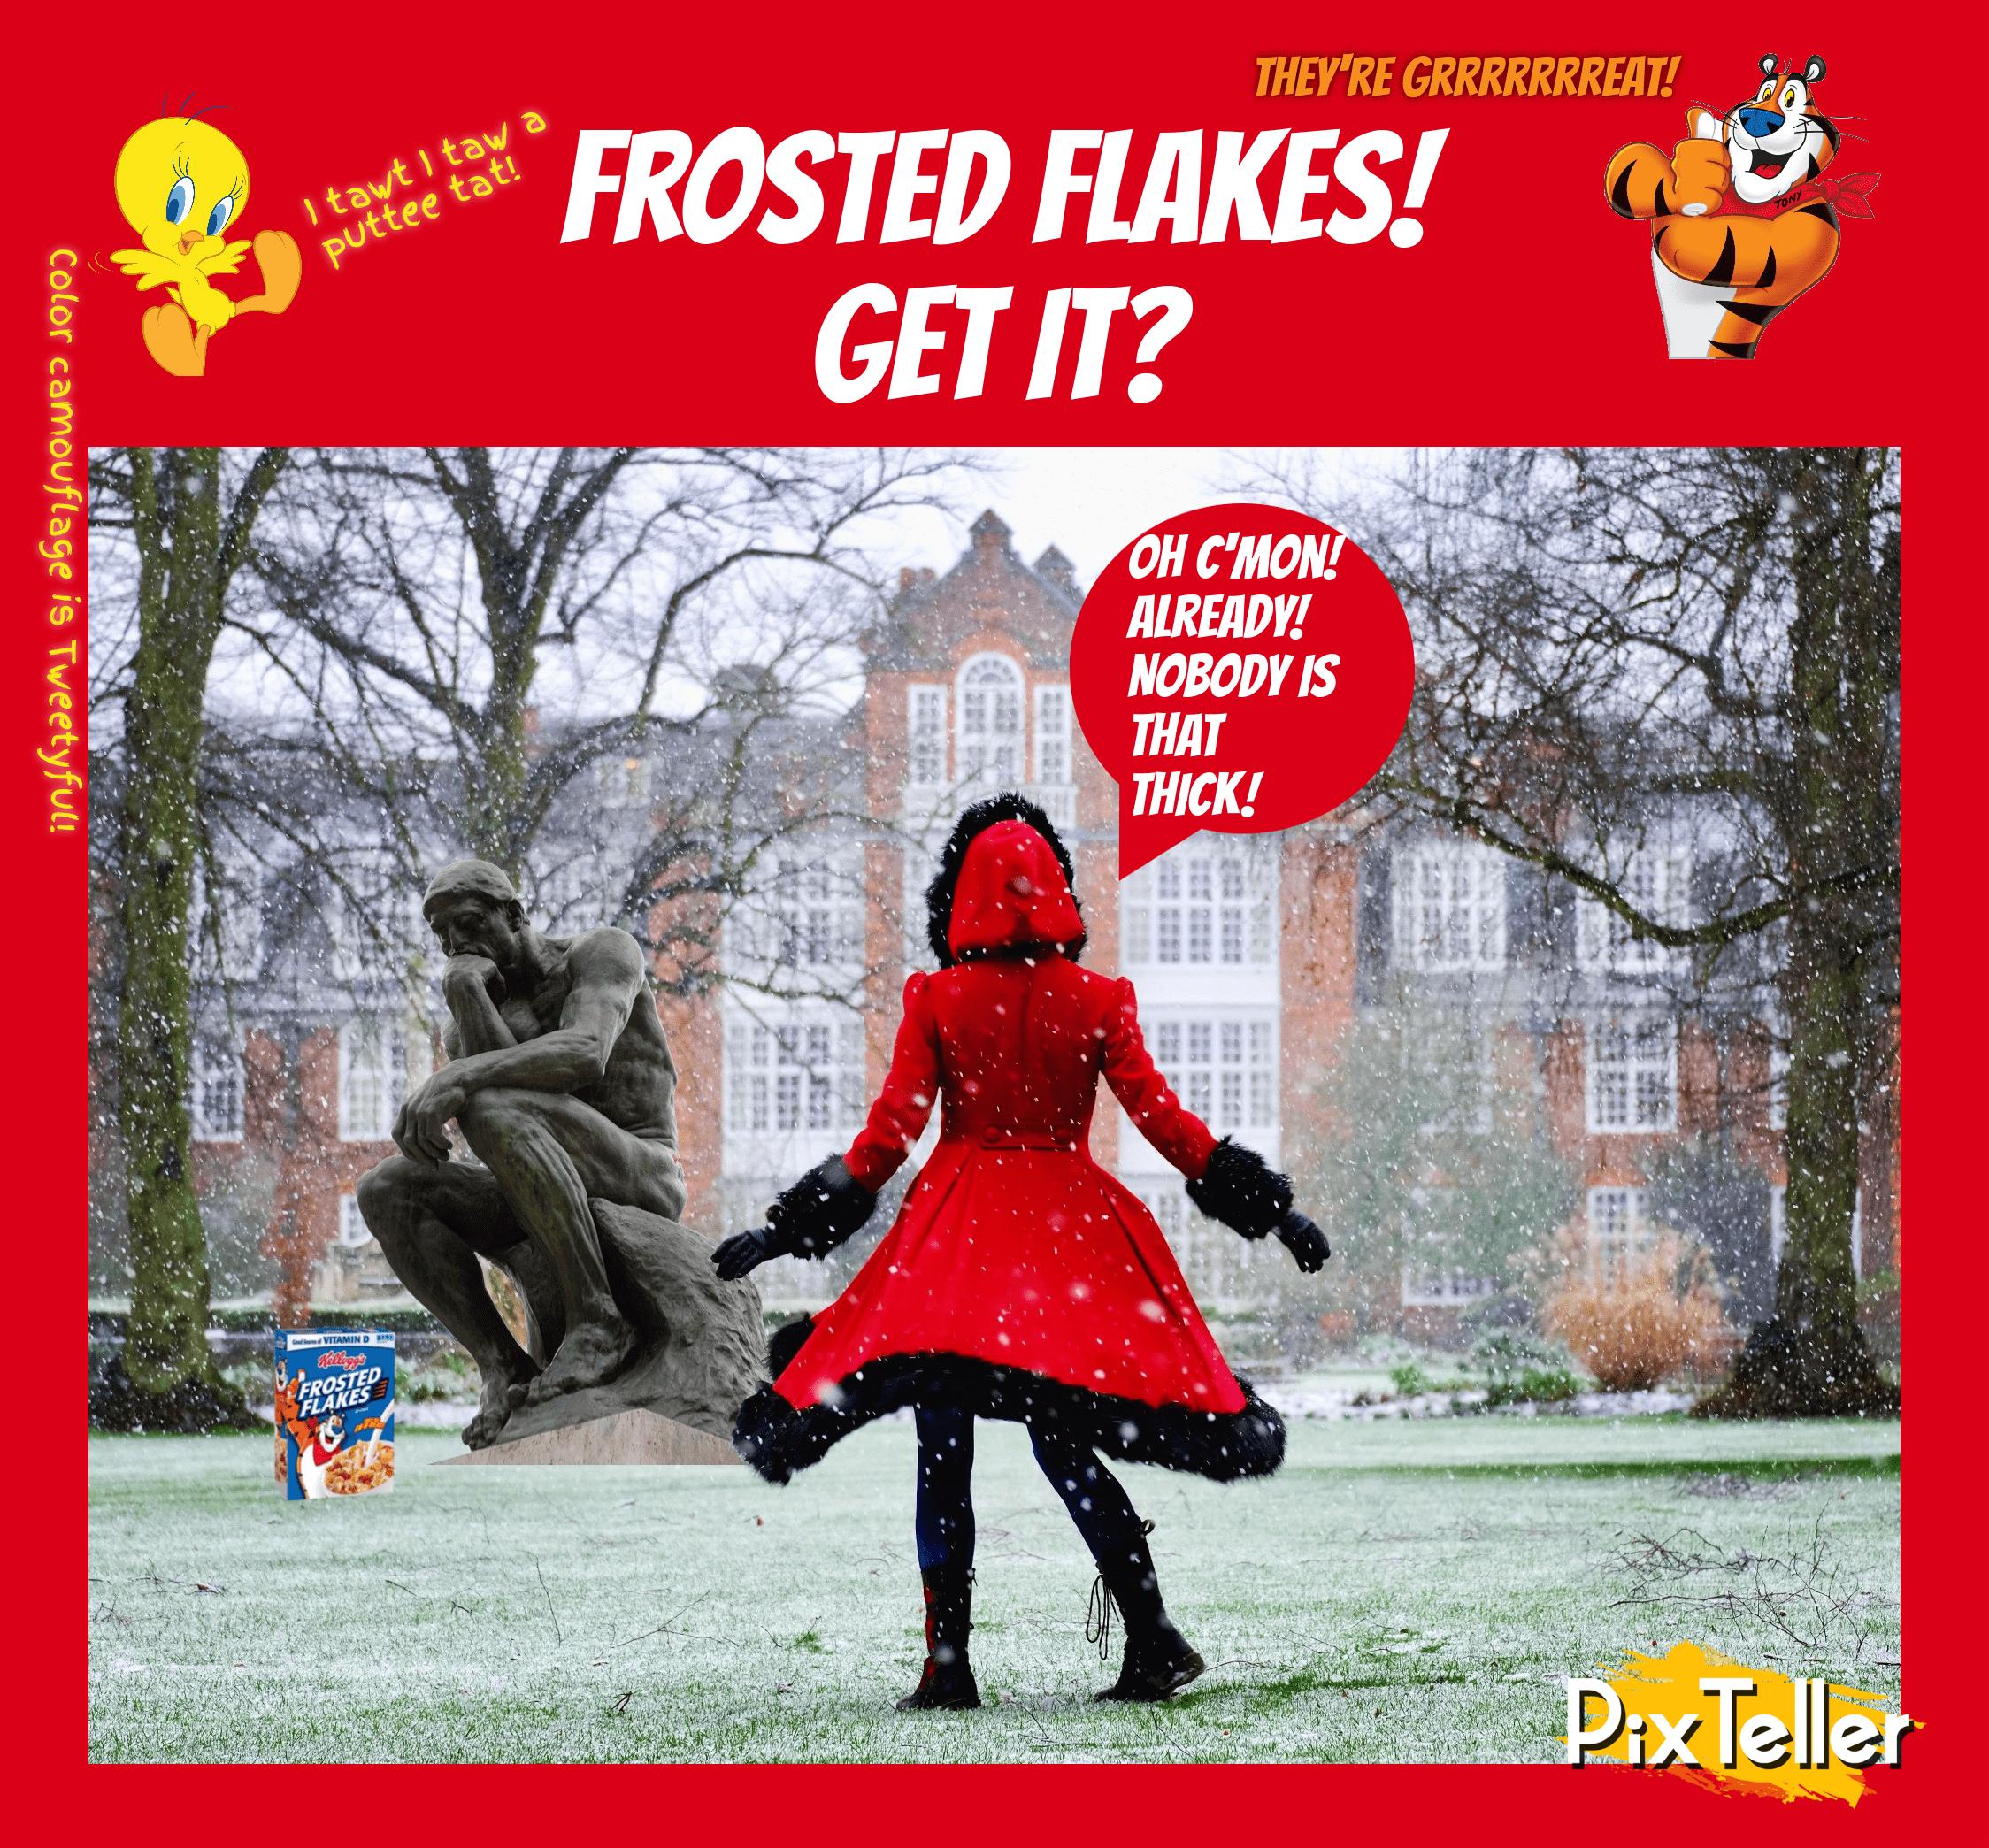 Advertising,                Tree,                Recreation,                Fun,                Christmas,                Winter,                White,                Black,                Red,                 Free Image